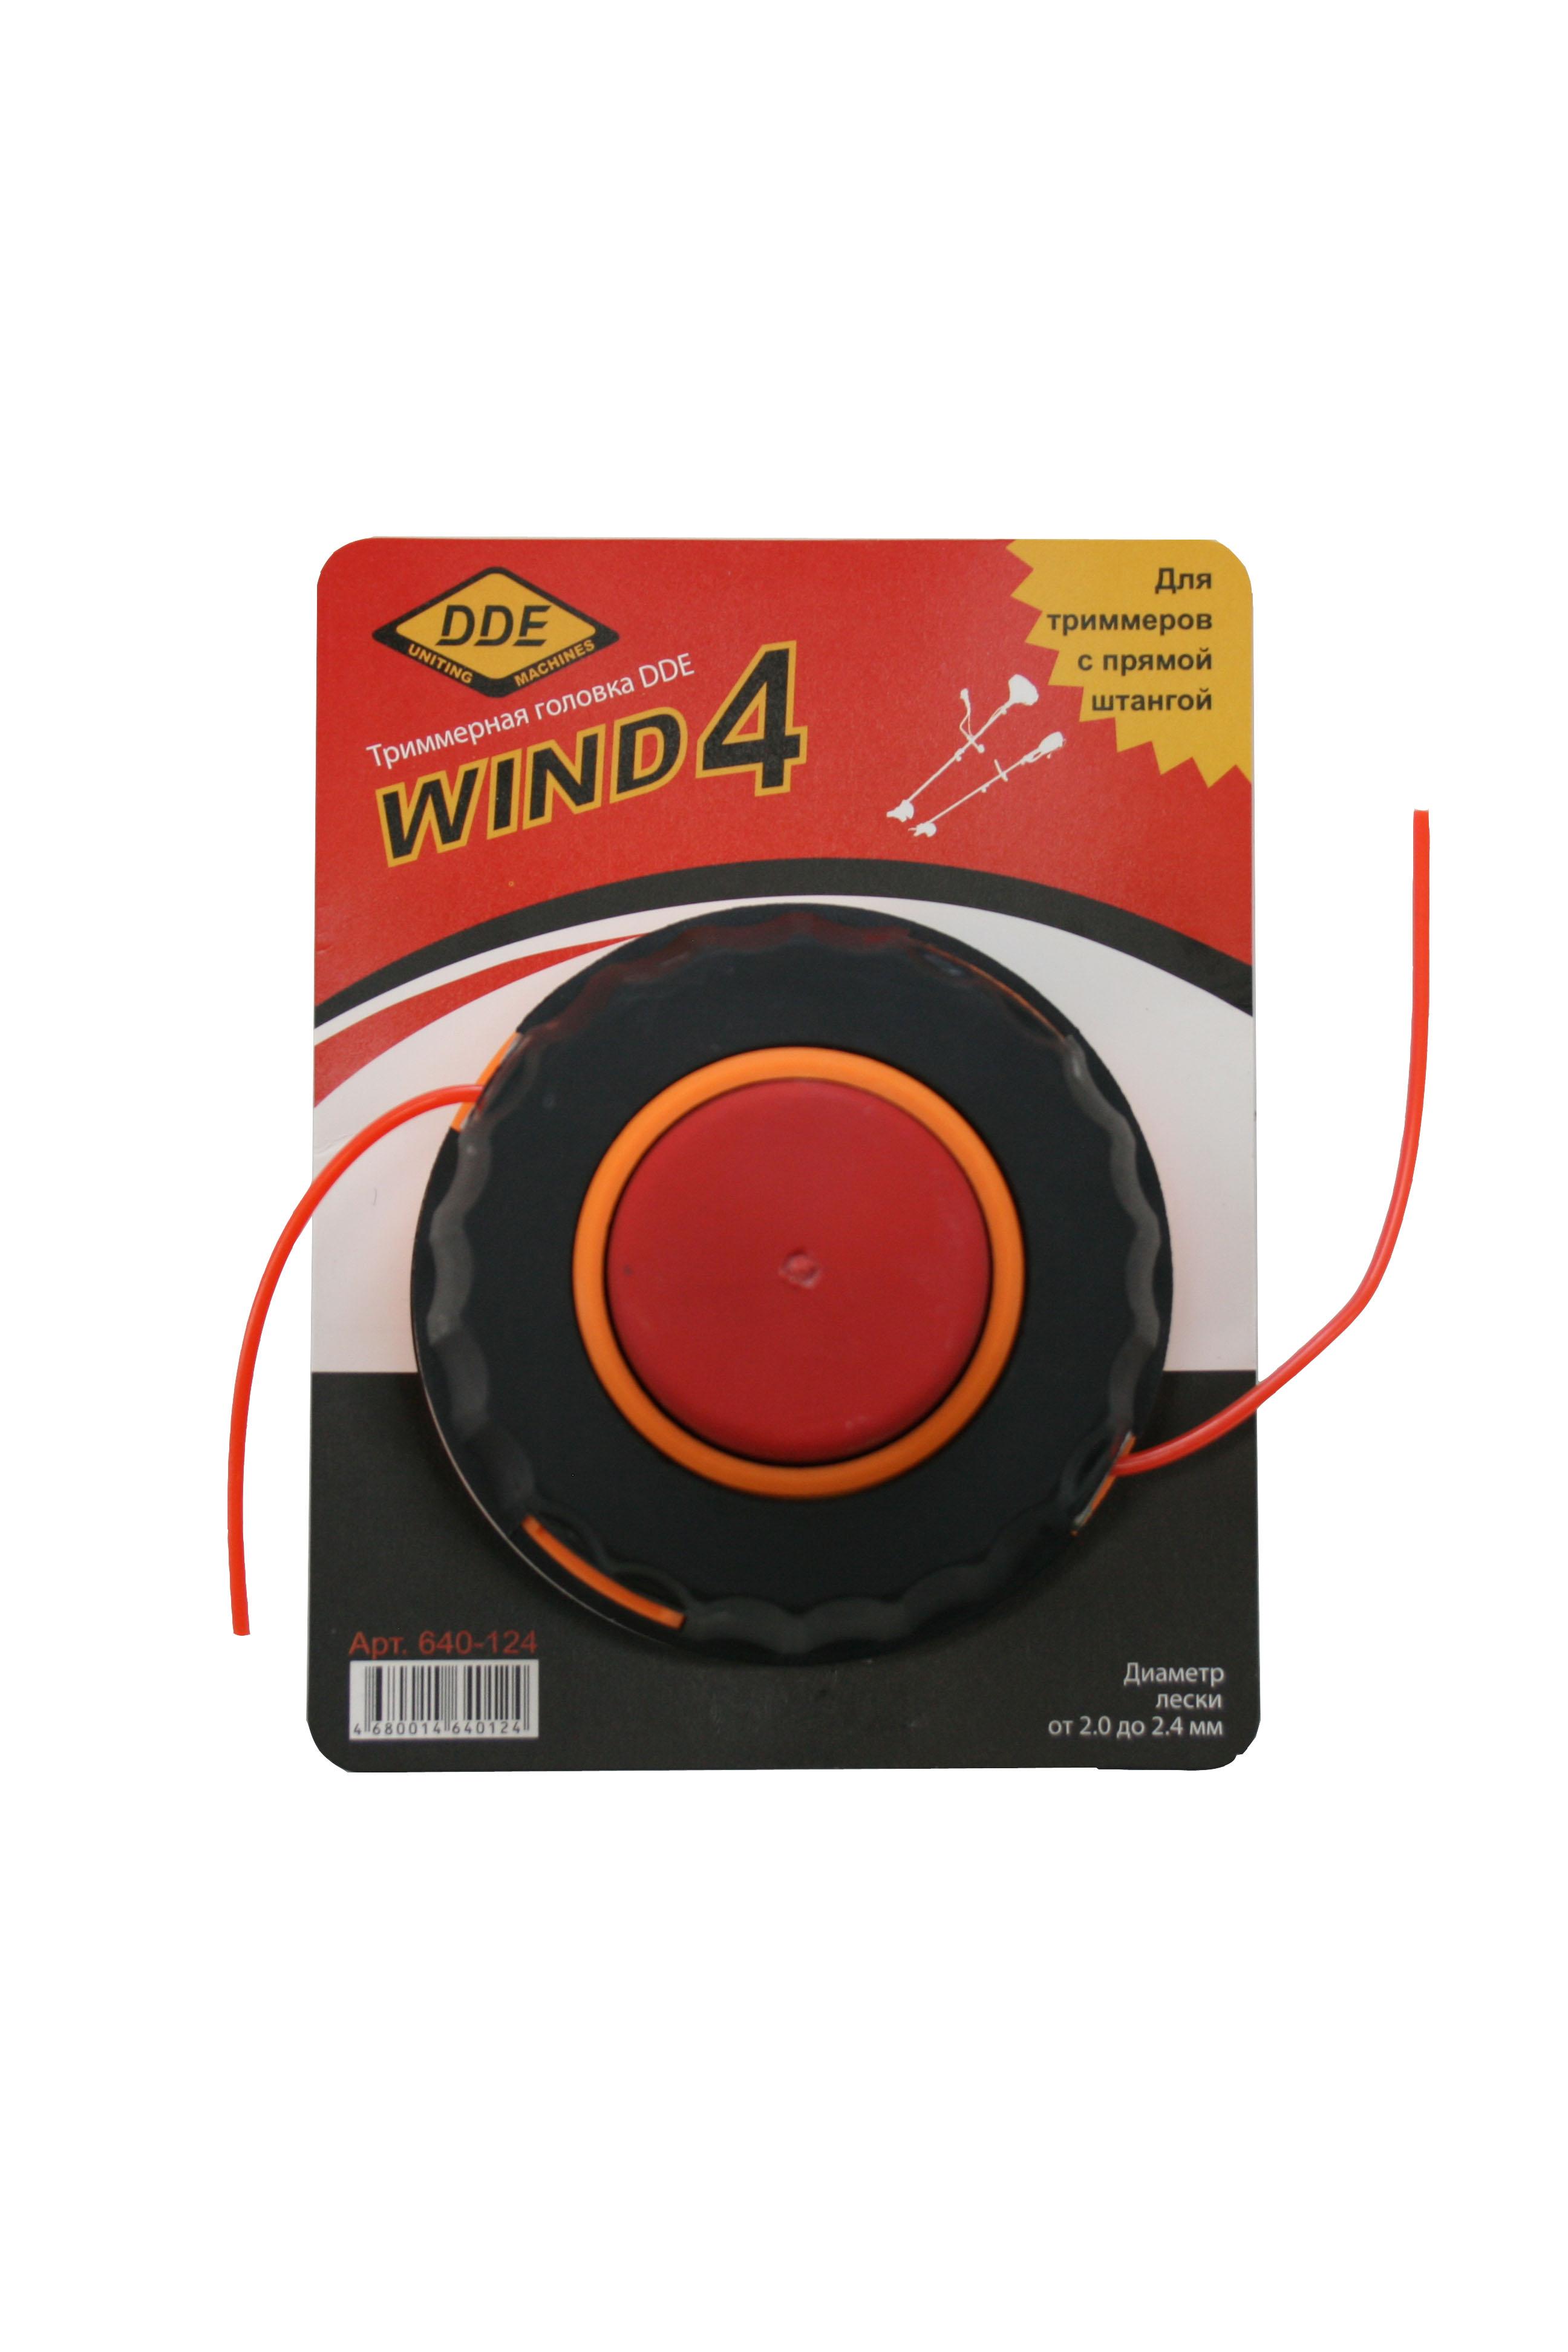 Режущая головка для кос Dde Wind4 головка dde гм 50